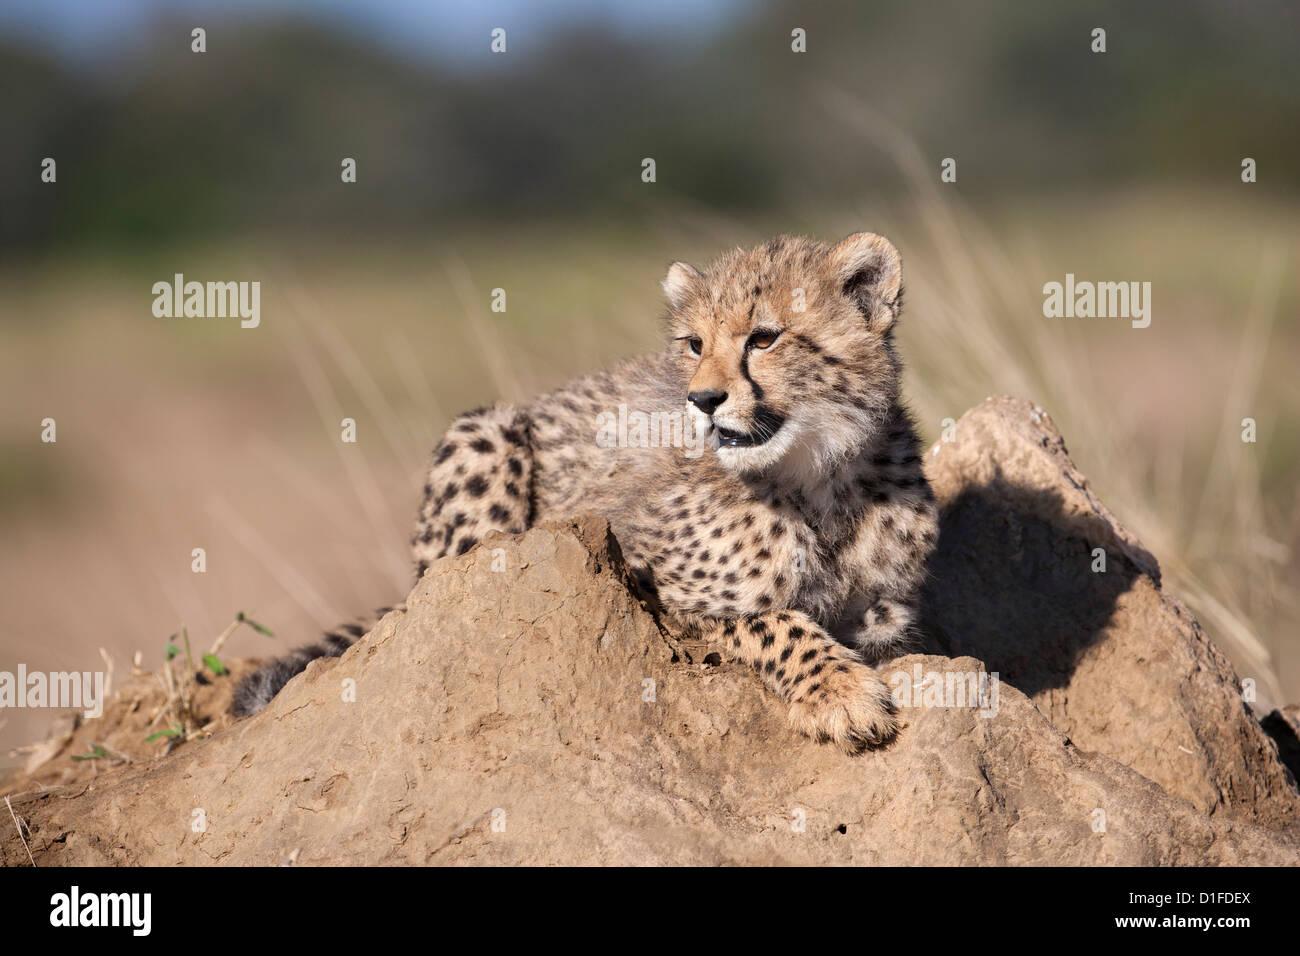 Cheetah (Acinonyx jubatus) cub, Phinda private game reserve, Kwazulu Natal, South Africa, Africa - Stock Image